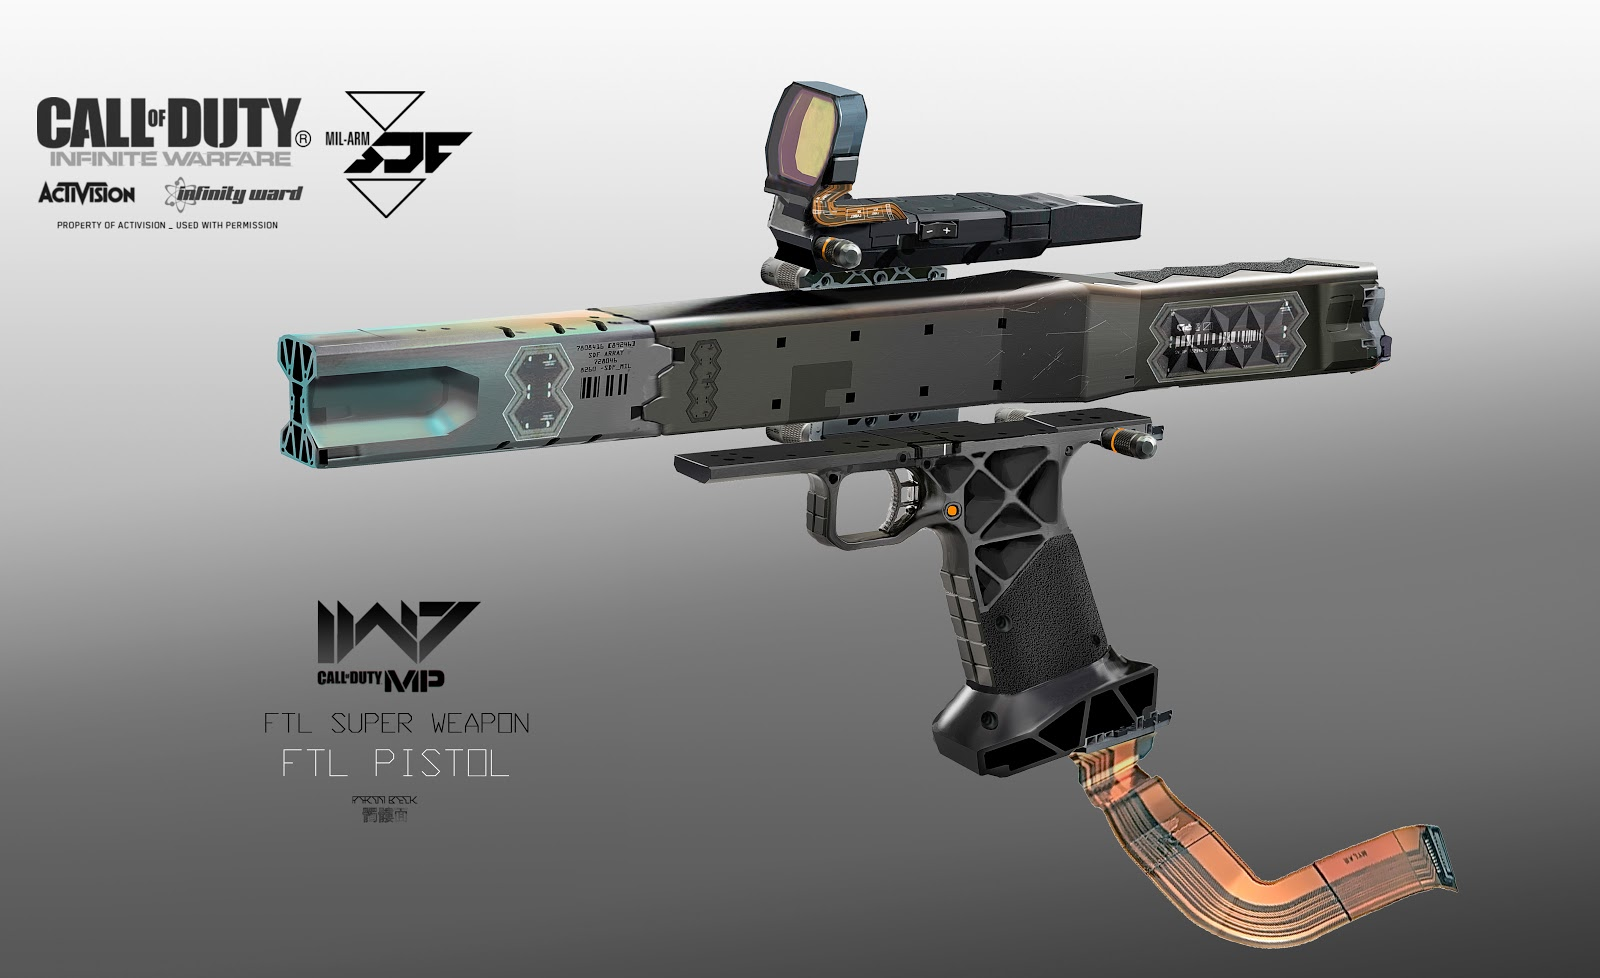 CODIW_FTL_pistol_01.jpg